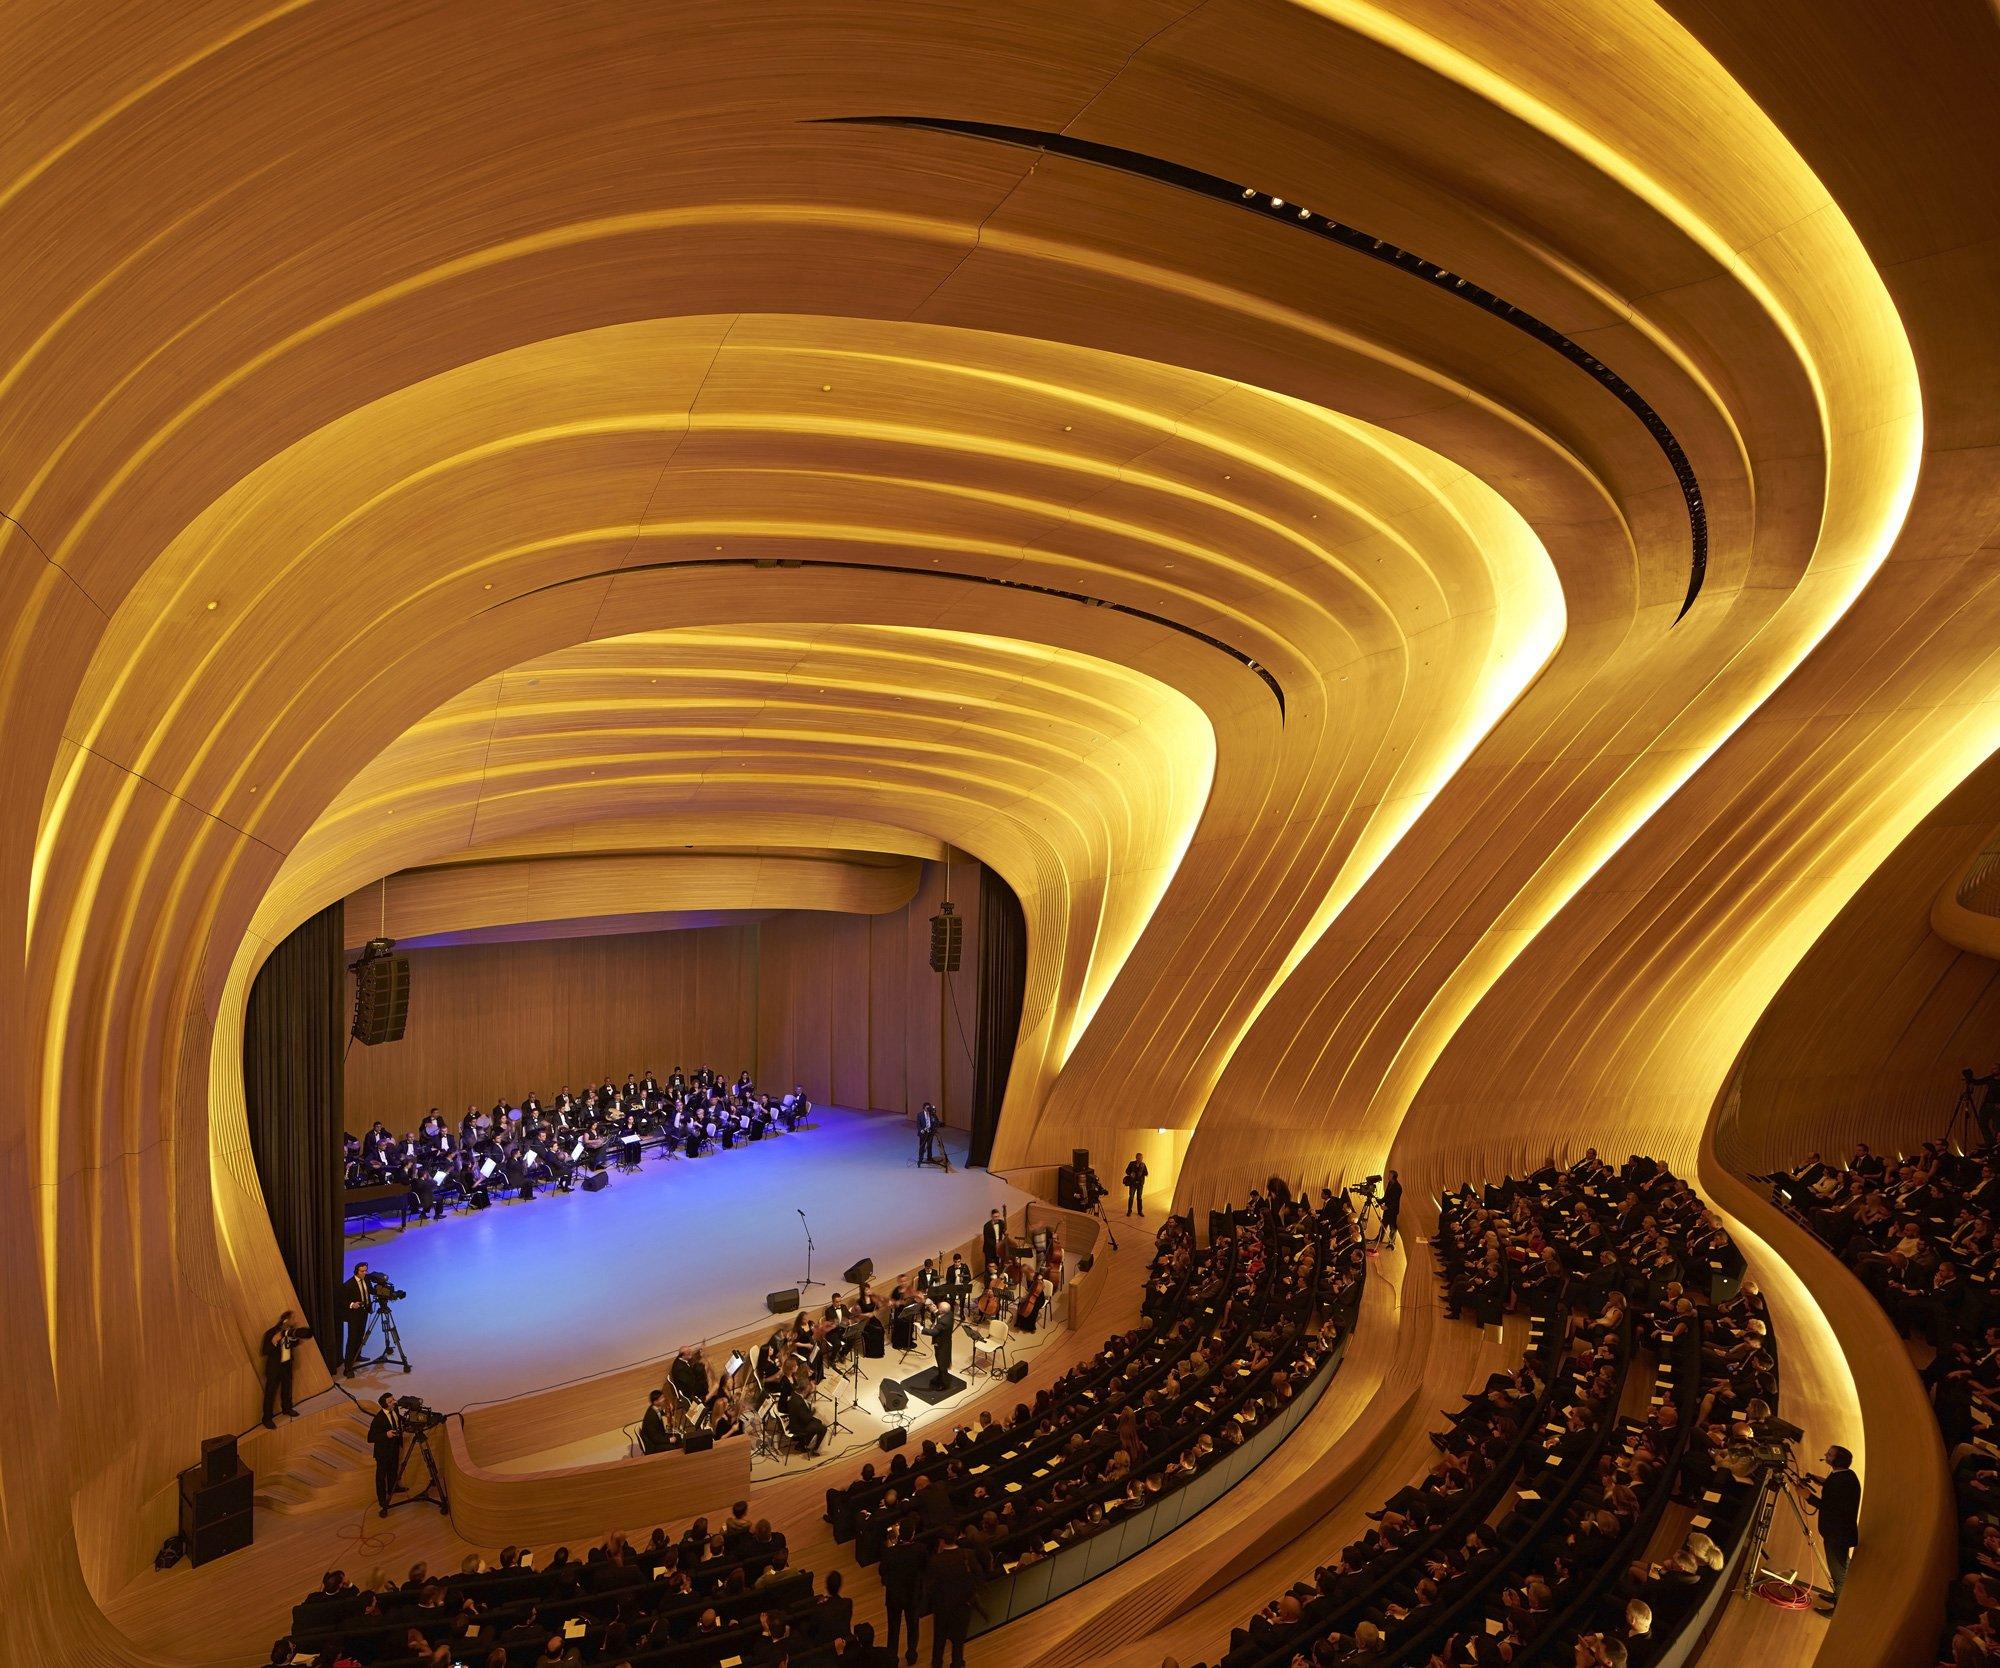 Heydar Aliyev Center, Zaha Hadid Architects © Hufton + Crow